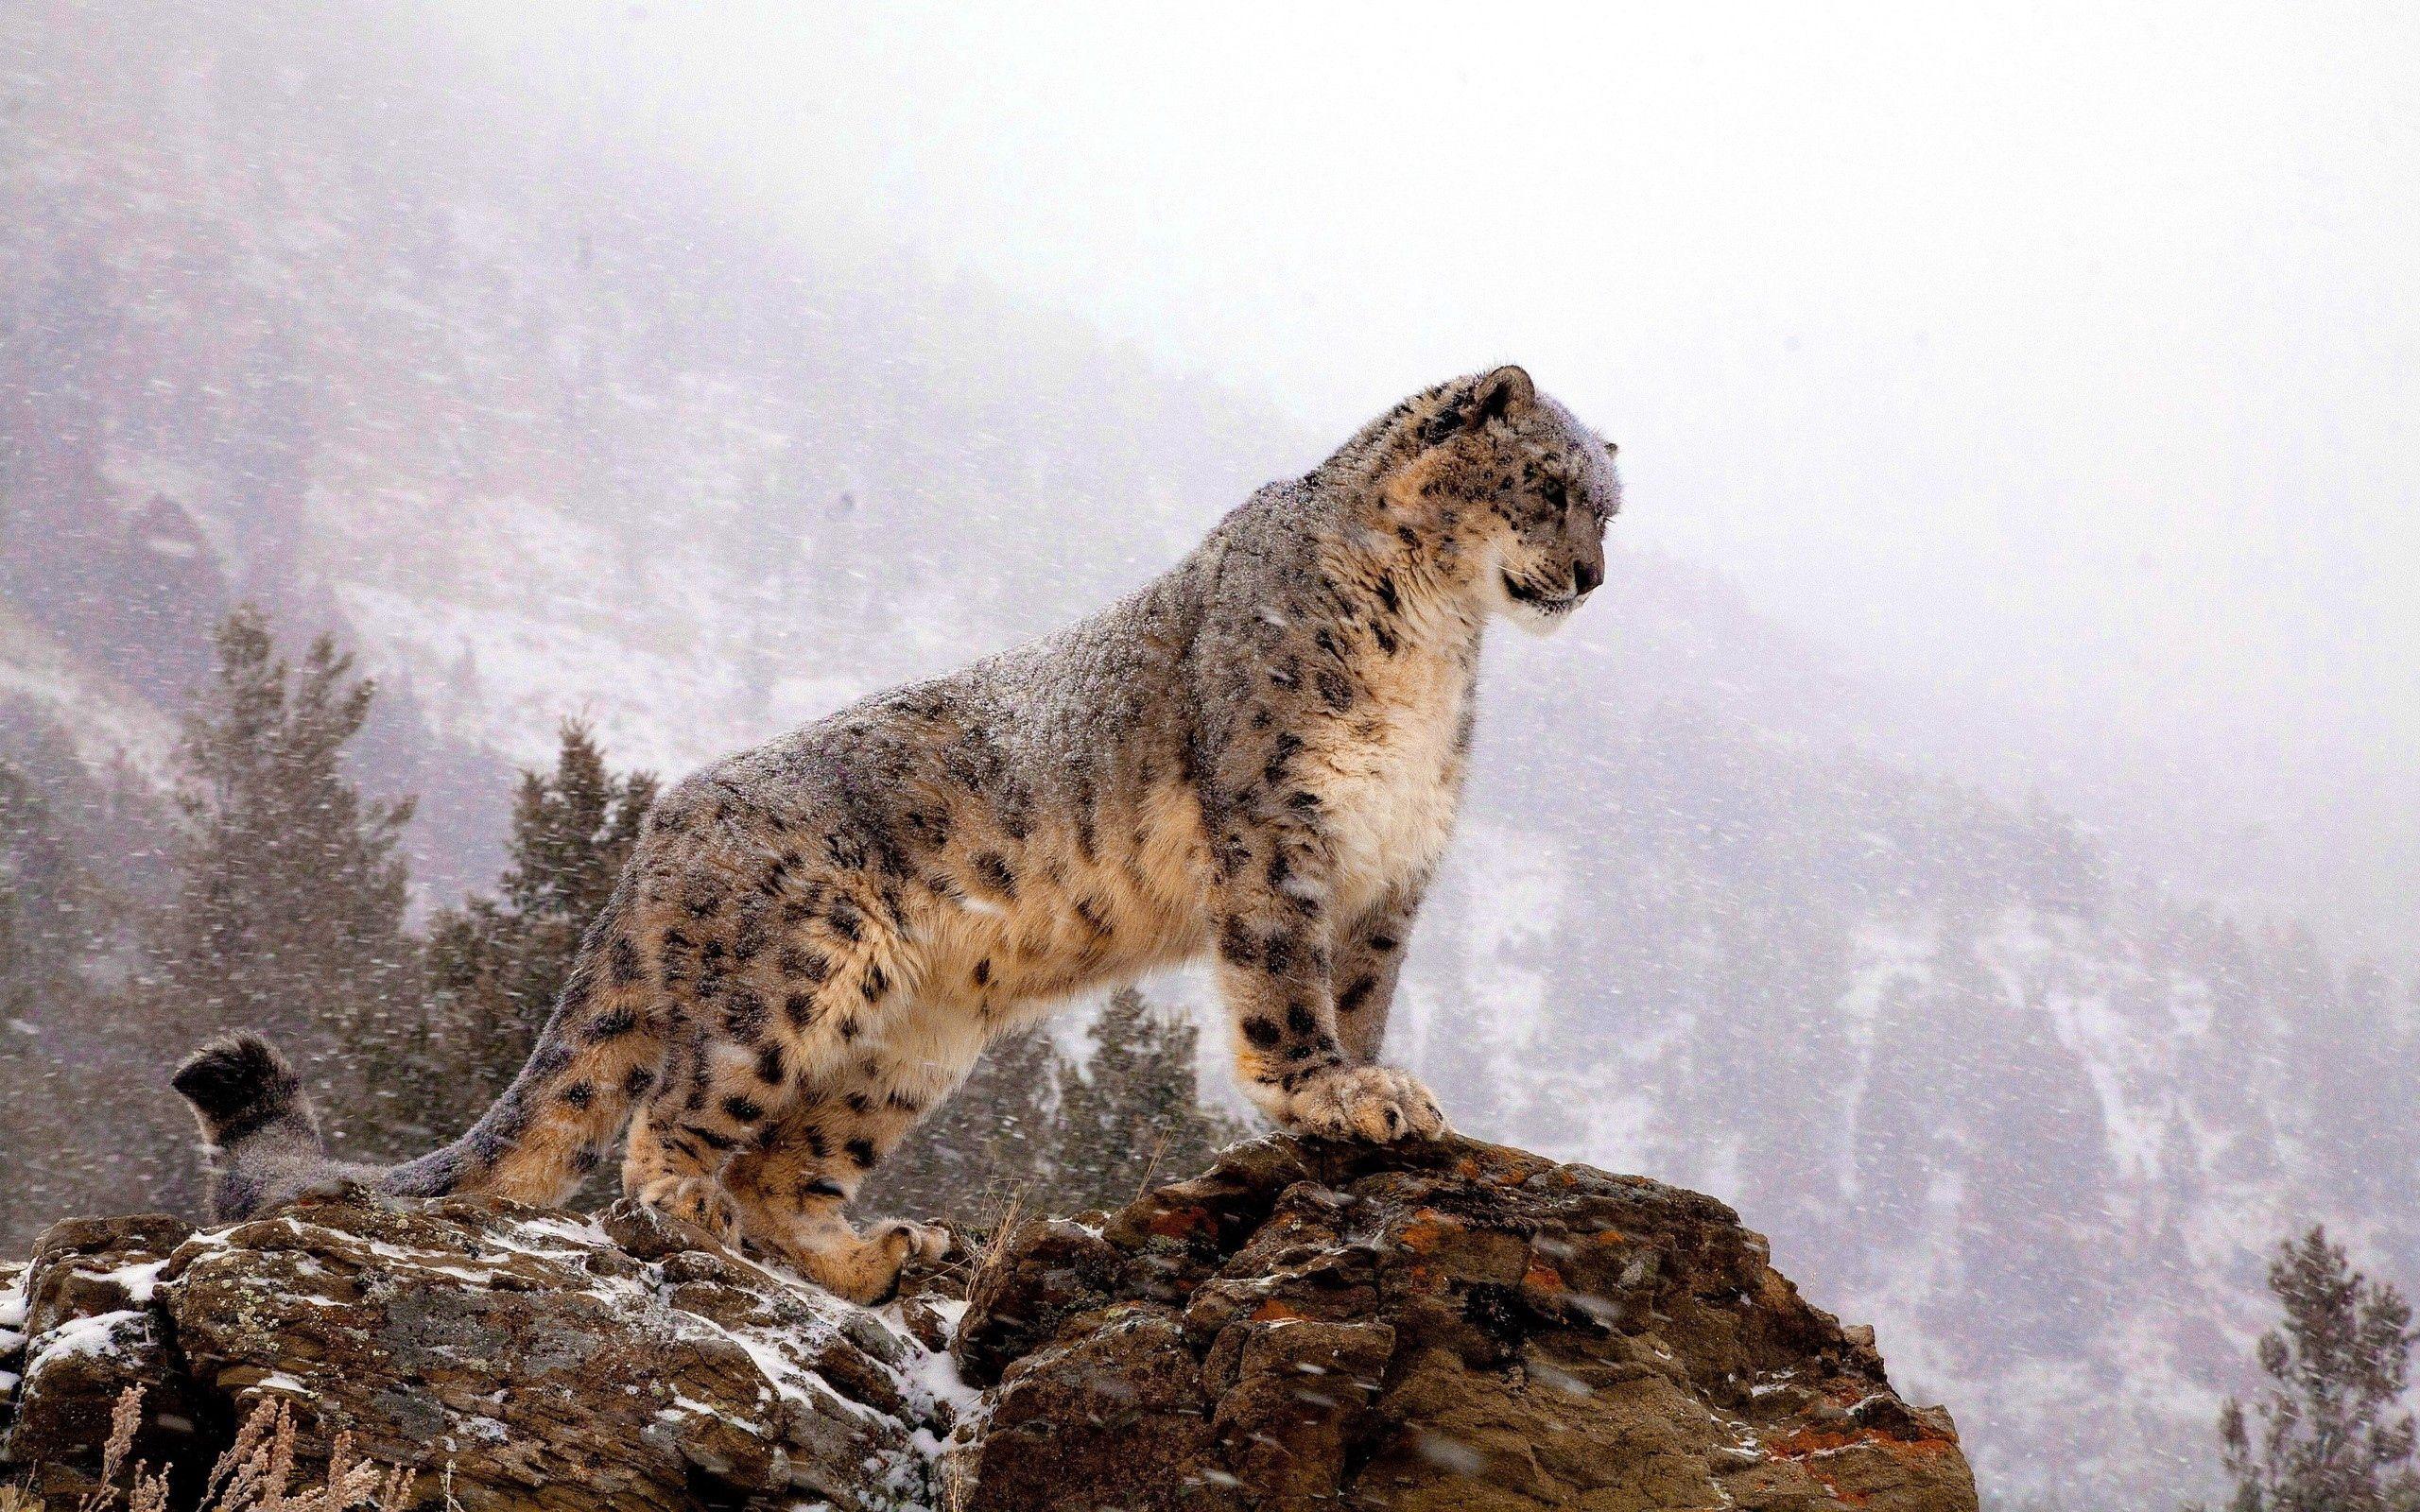 69760 download wallpaper Animals, Vertex, Top, Big Cat, Predator, Snow Leopard screensavers and pictures for free